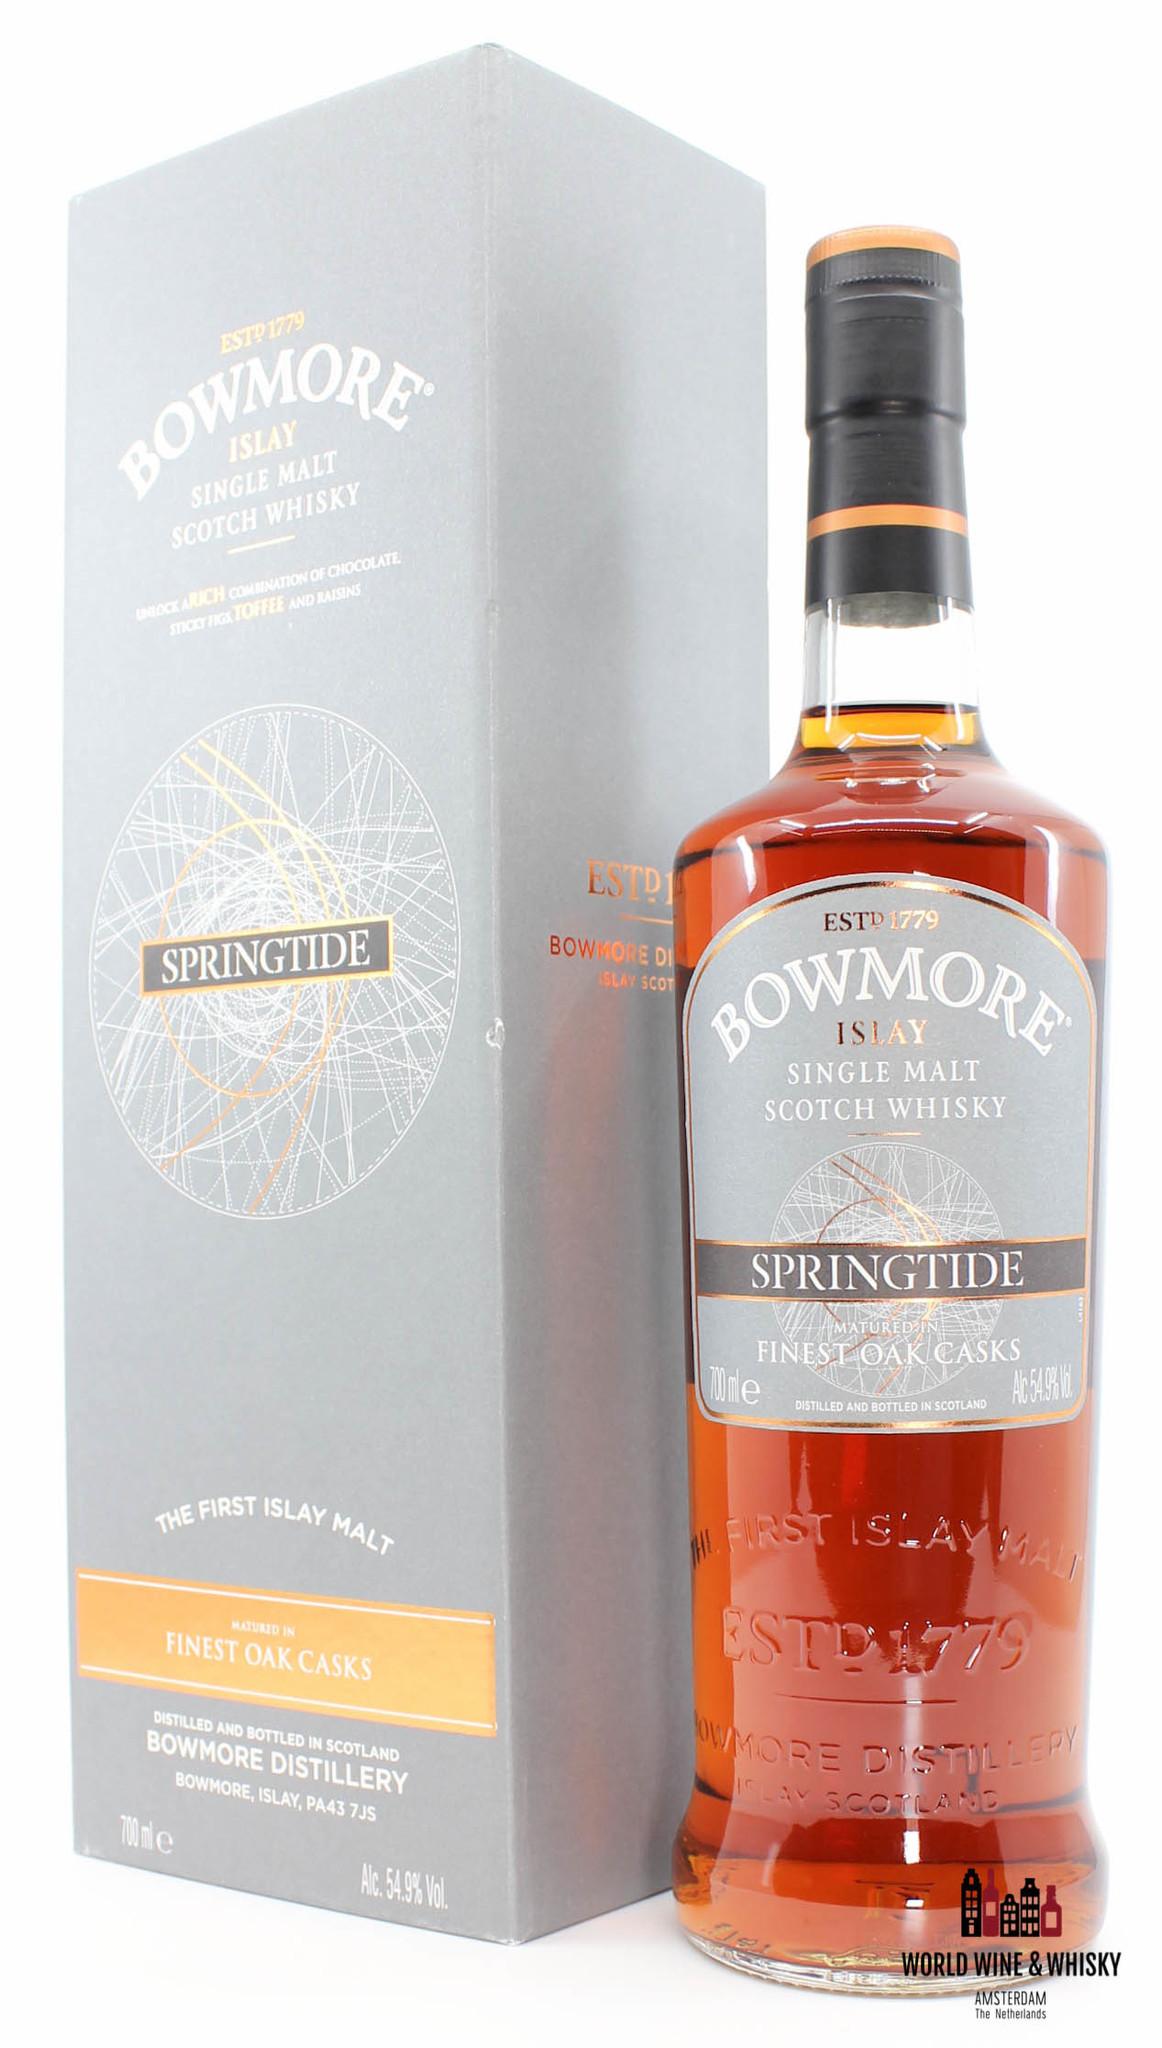 Bowmore Bowmore Springtide 2016 - Finest Oak Casks 54.9% (one of 4000 bottles)